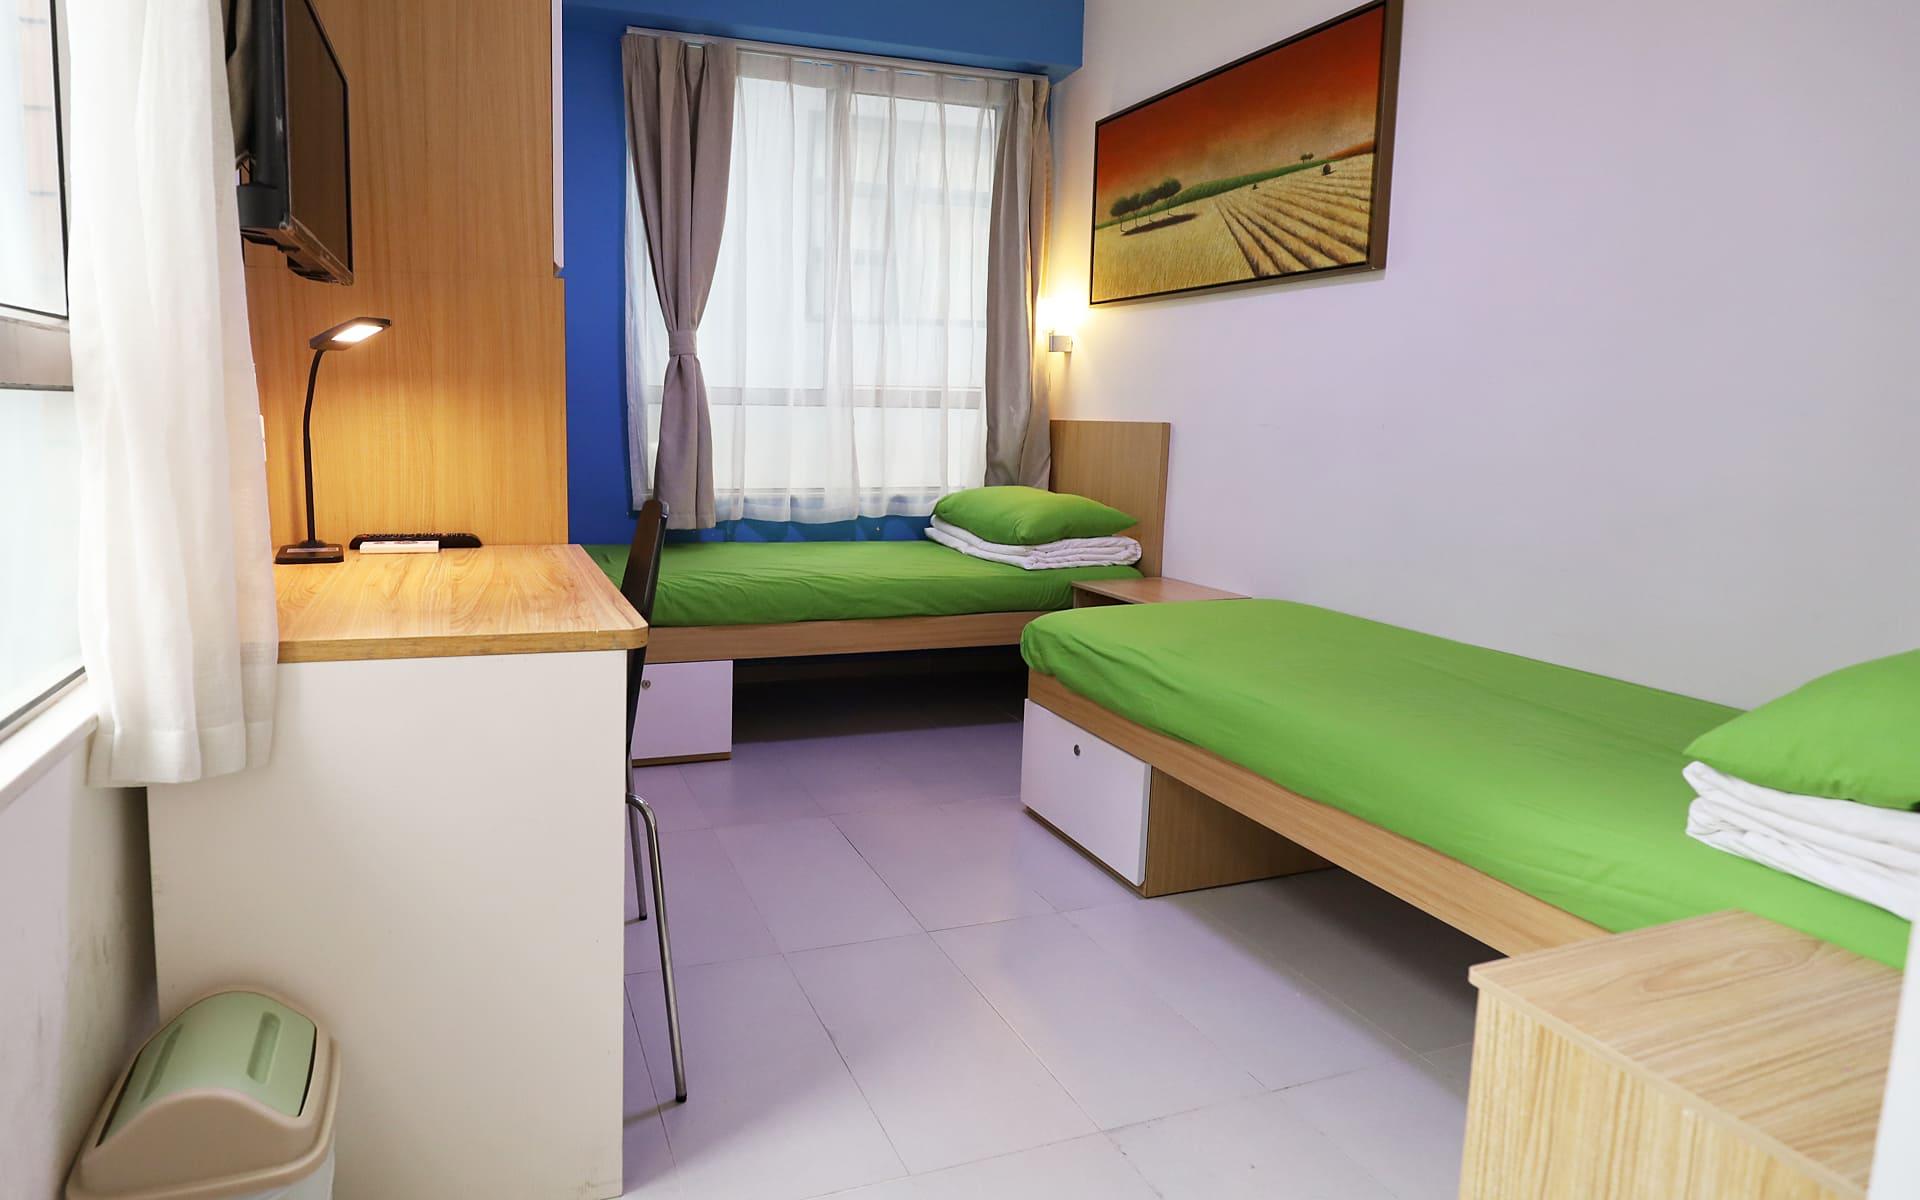 hk_service_apartment_16489580321589362127.jpg